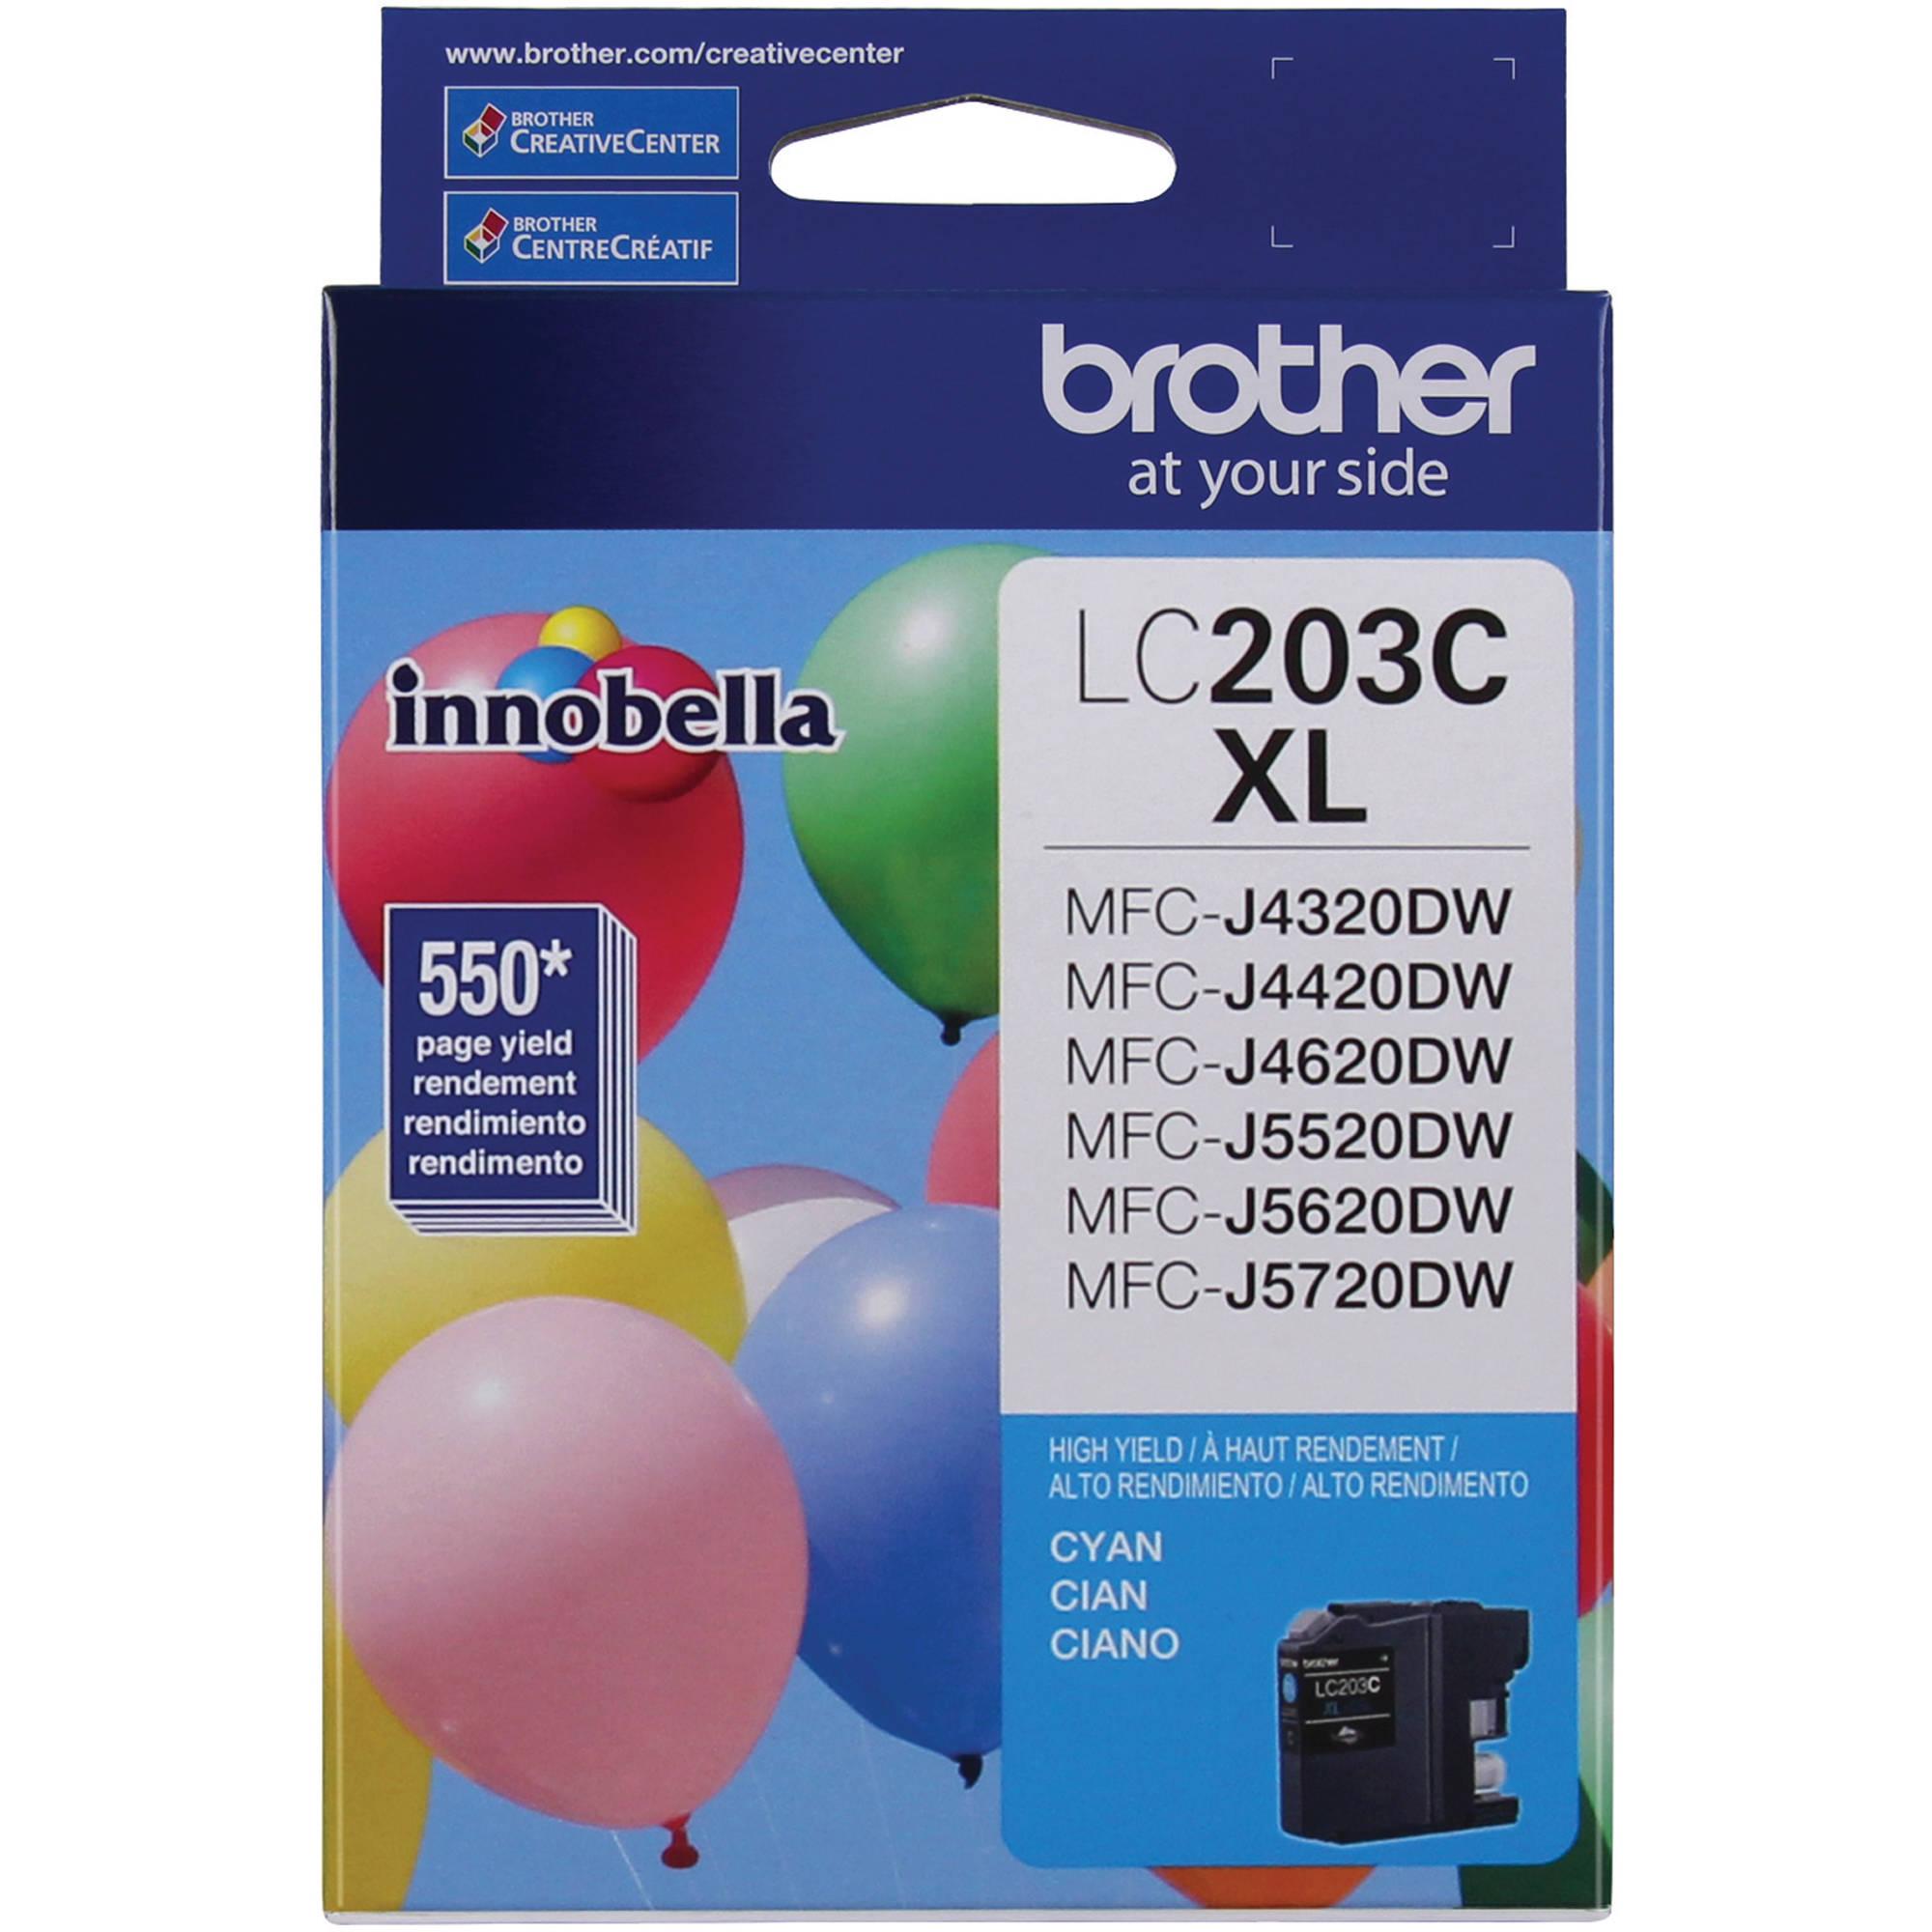 Brother LC203C Innobella High Yield XL Series Cyan Ink Cartridge